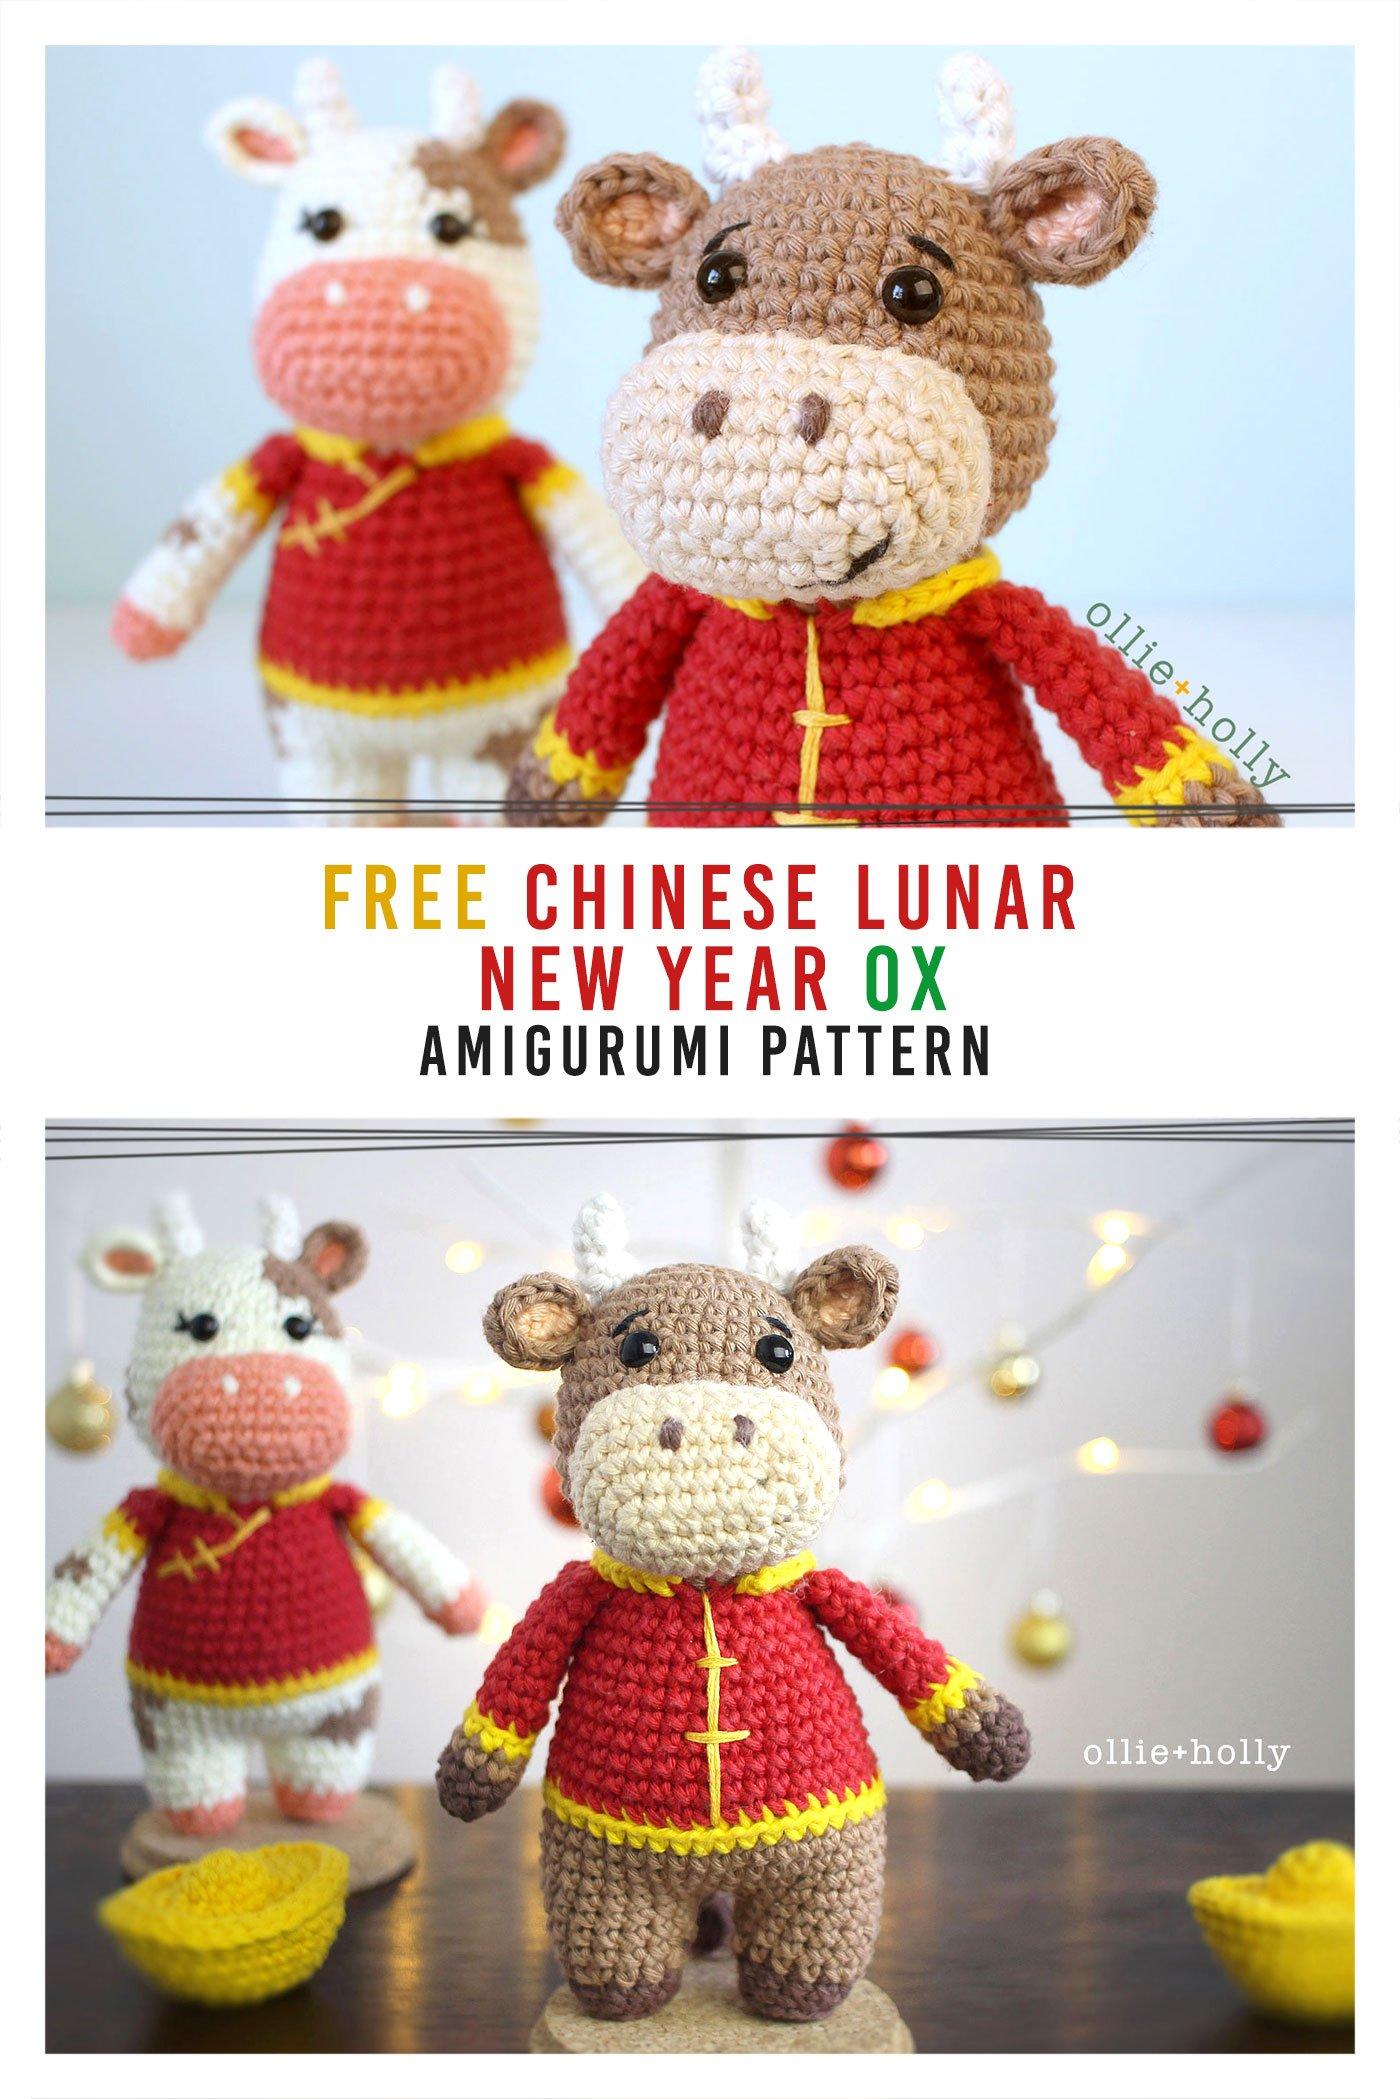 Free Year of the Ox Chinese Lunar New Year Amigurumi Crochet Pattern